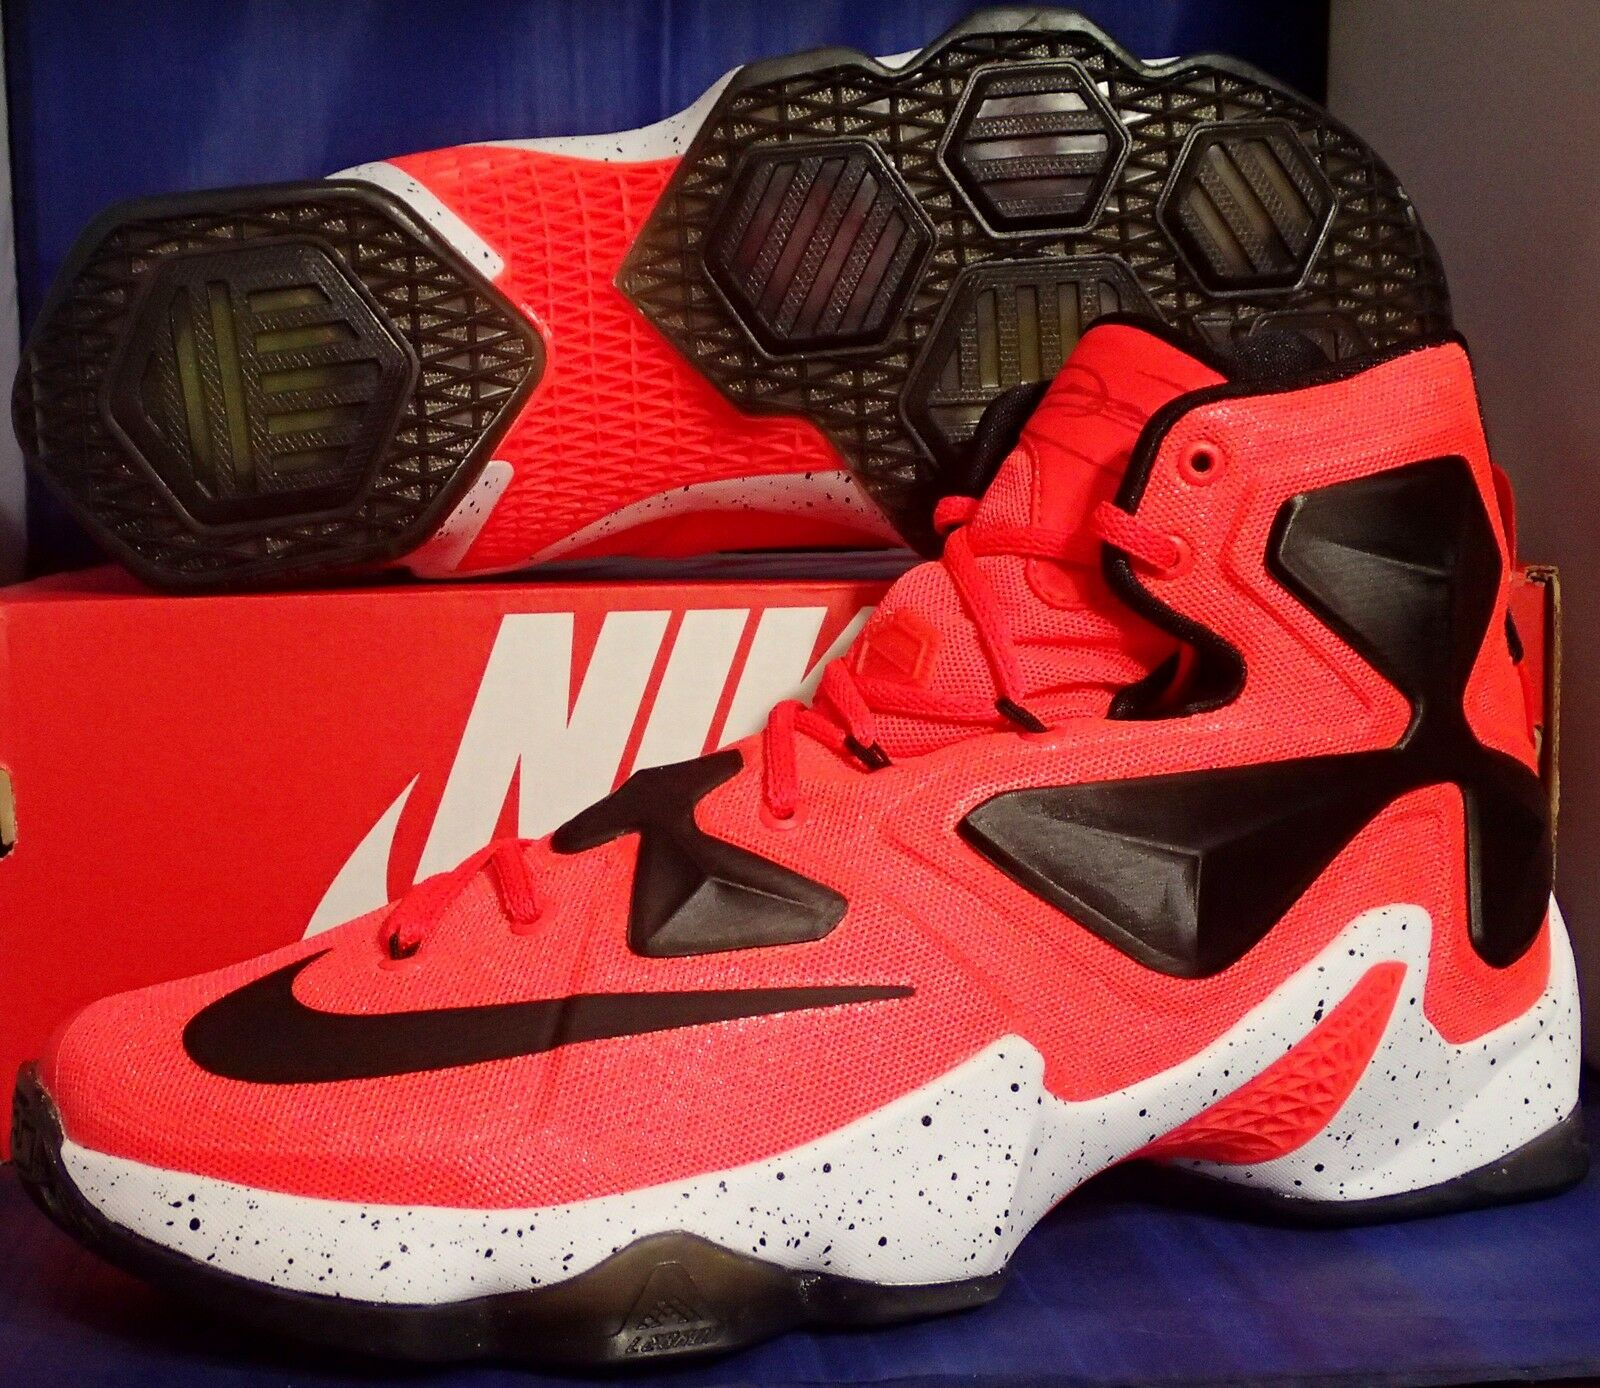 Nike Lebron XIII 13 iD Bright Crimson White Black SZ 10.5 ( 836141-992 )